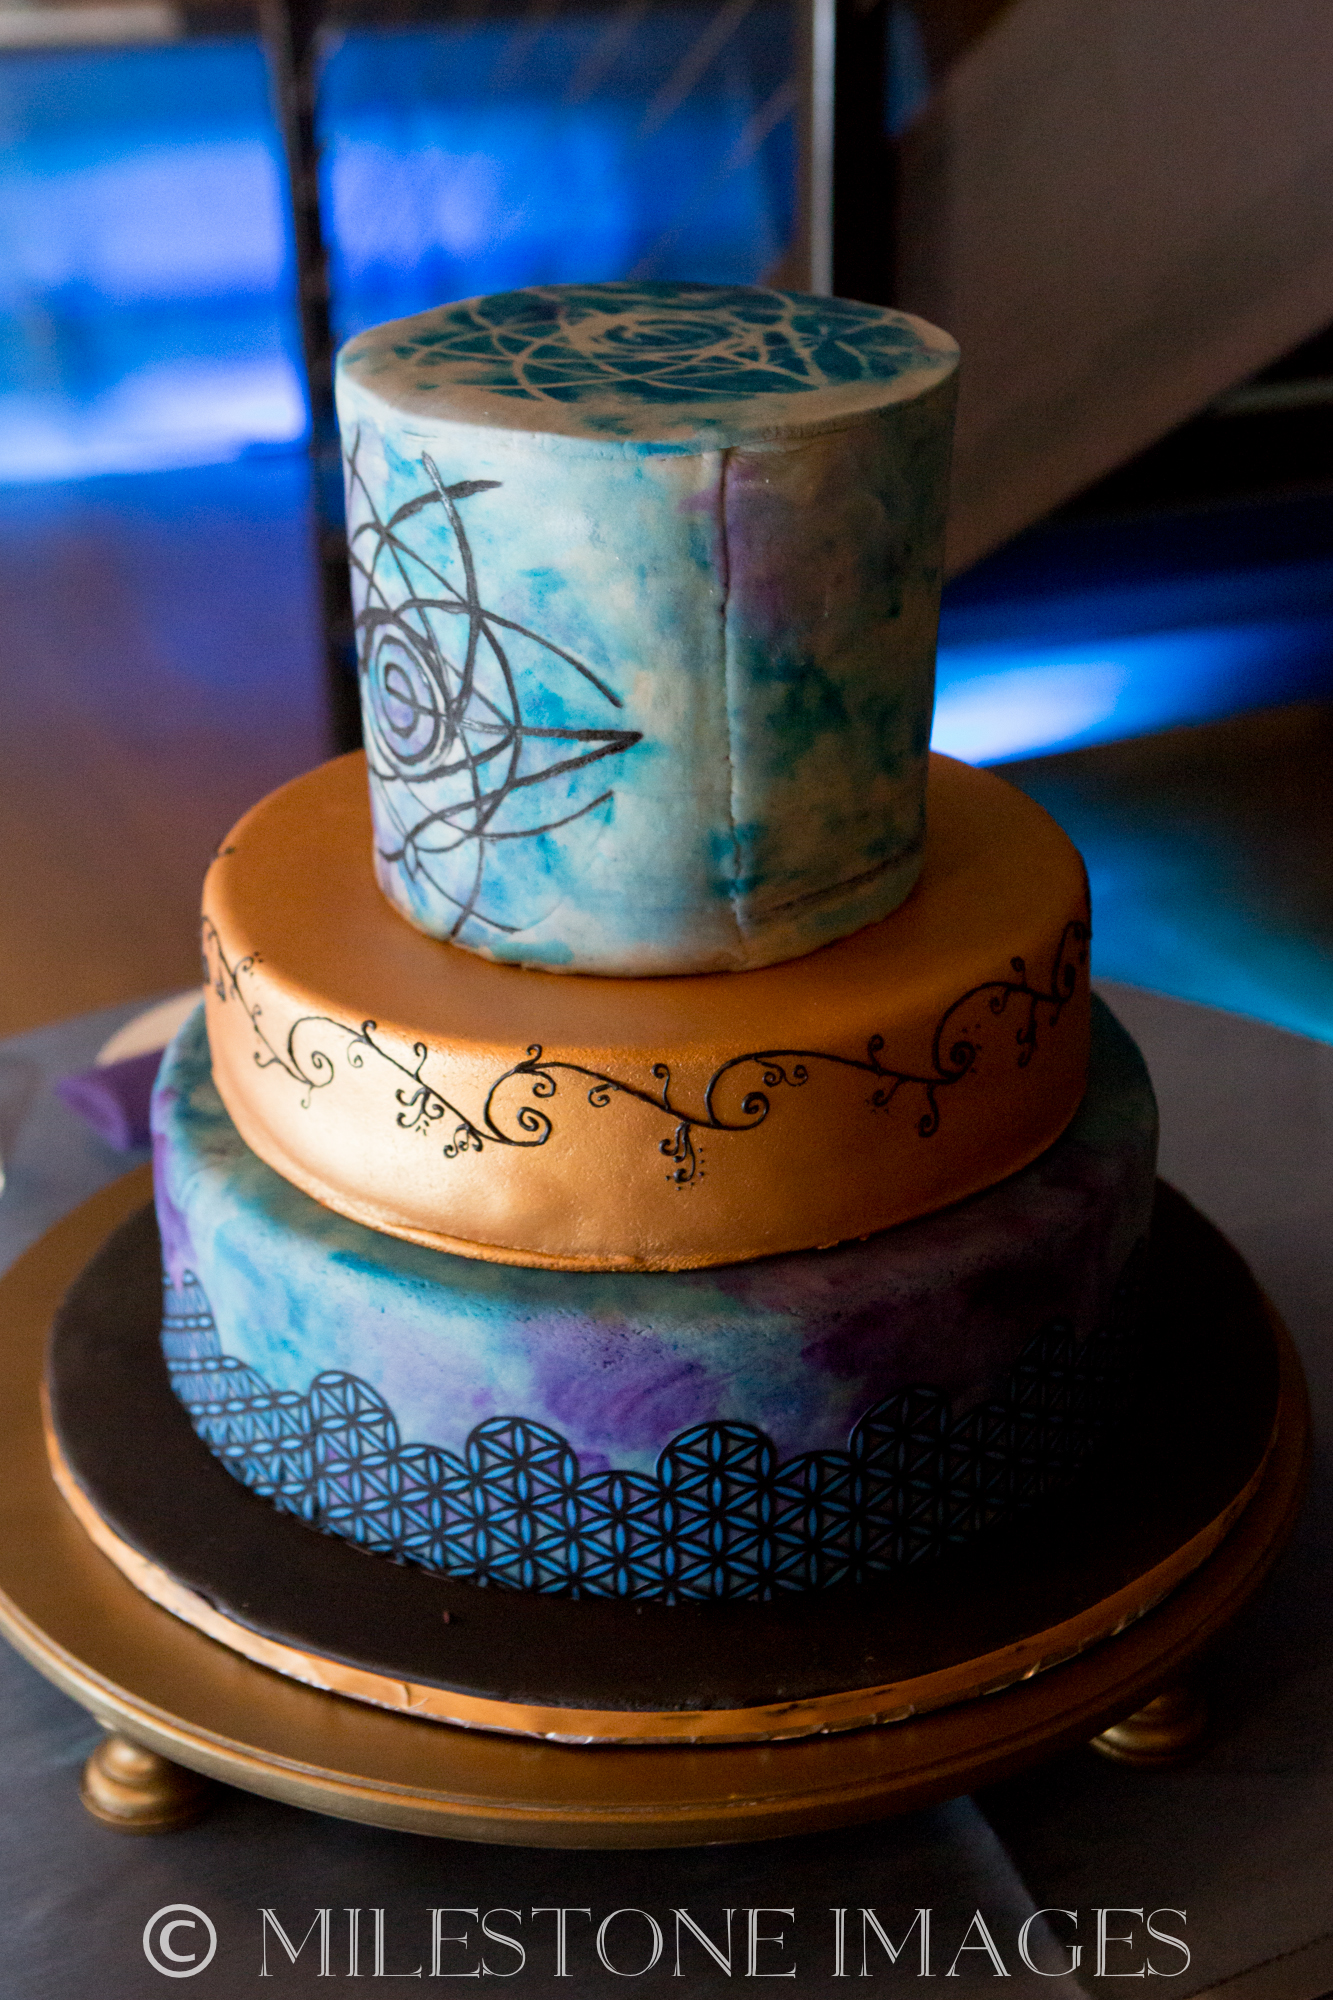 Milestone-C&O Cake.jpg